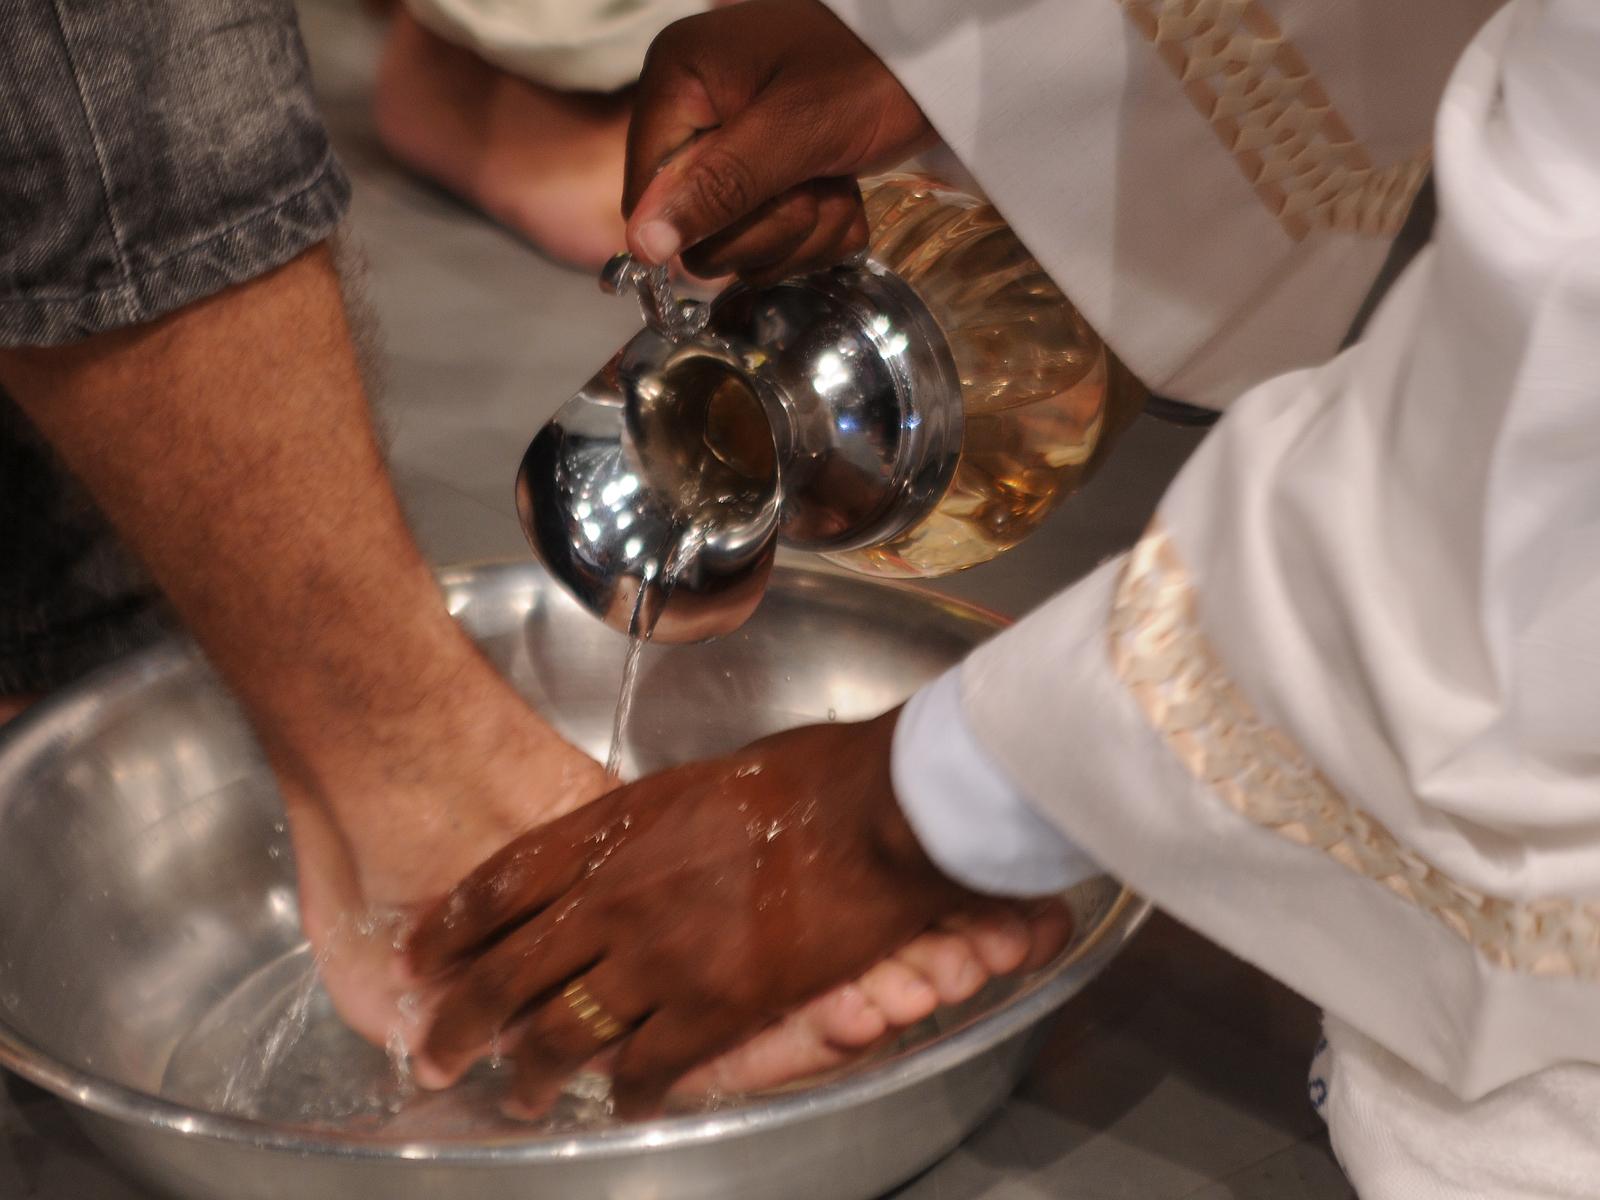 quinta-feira-santa-e-jesus-nos-ensina-o-que-e-humildade